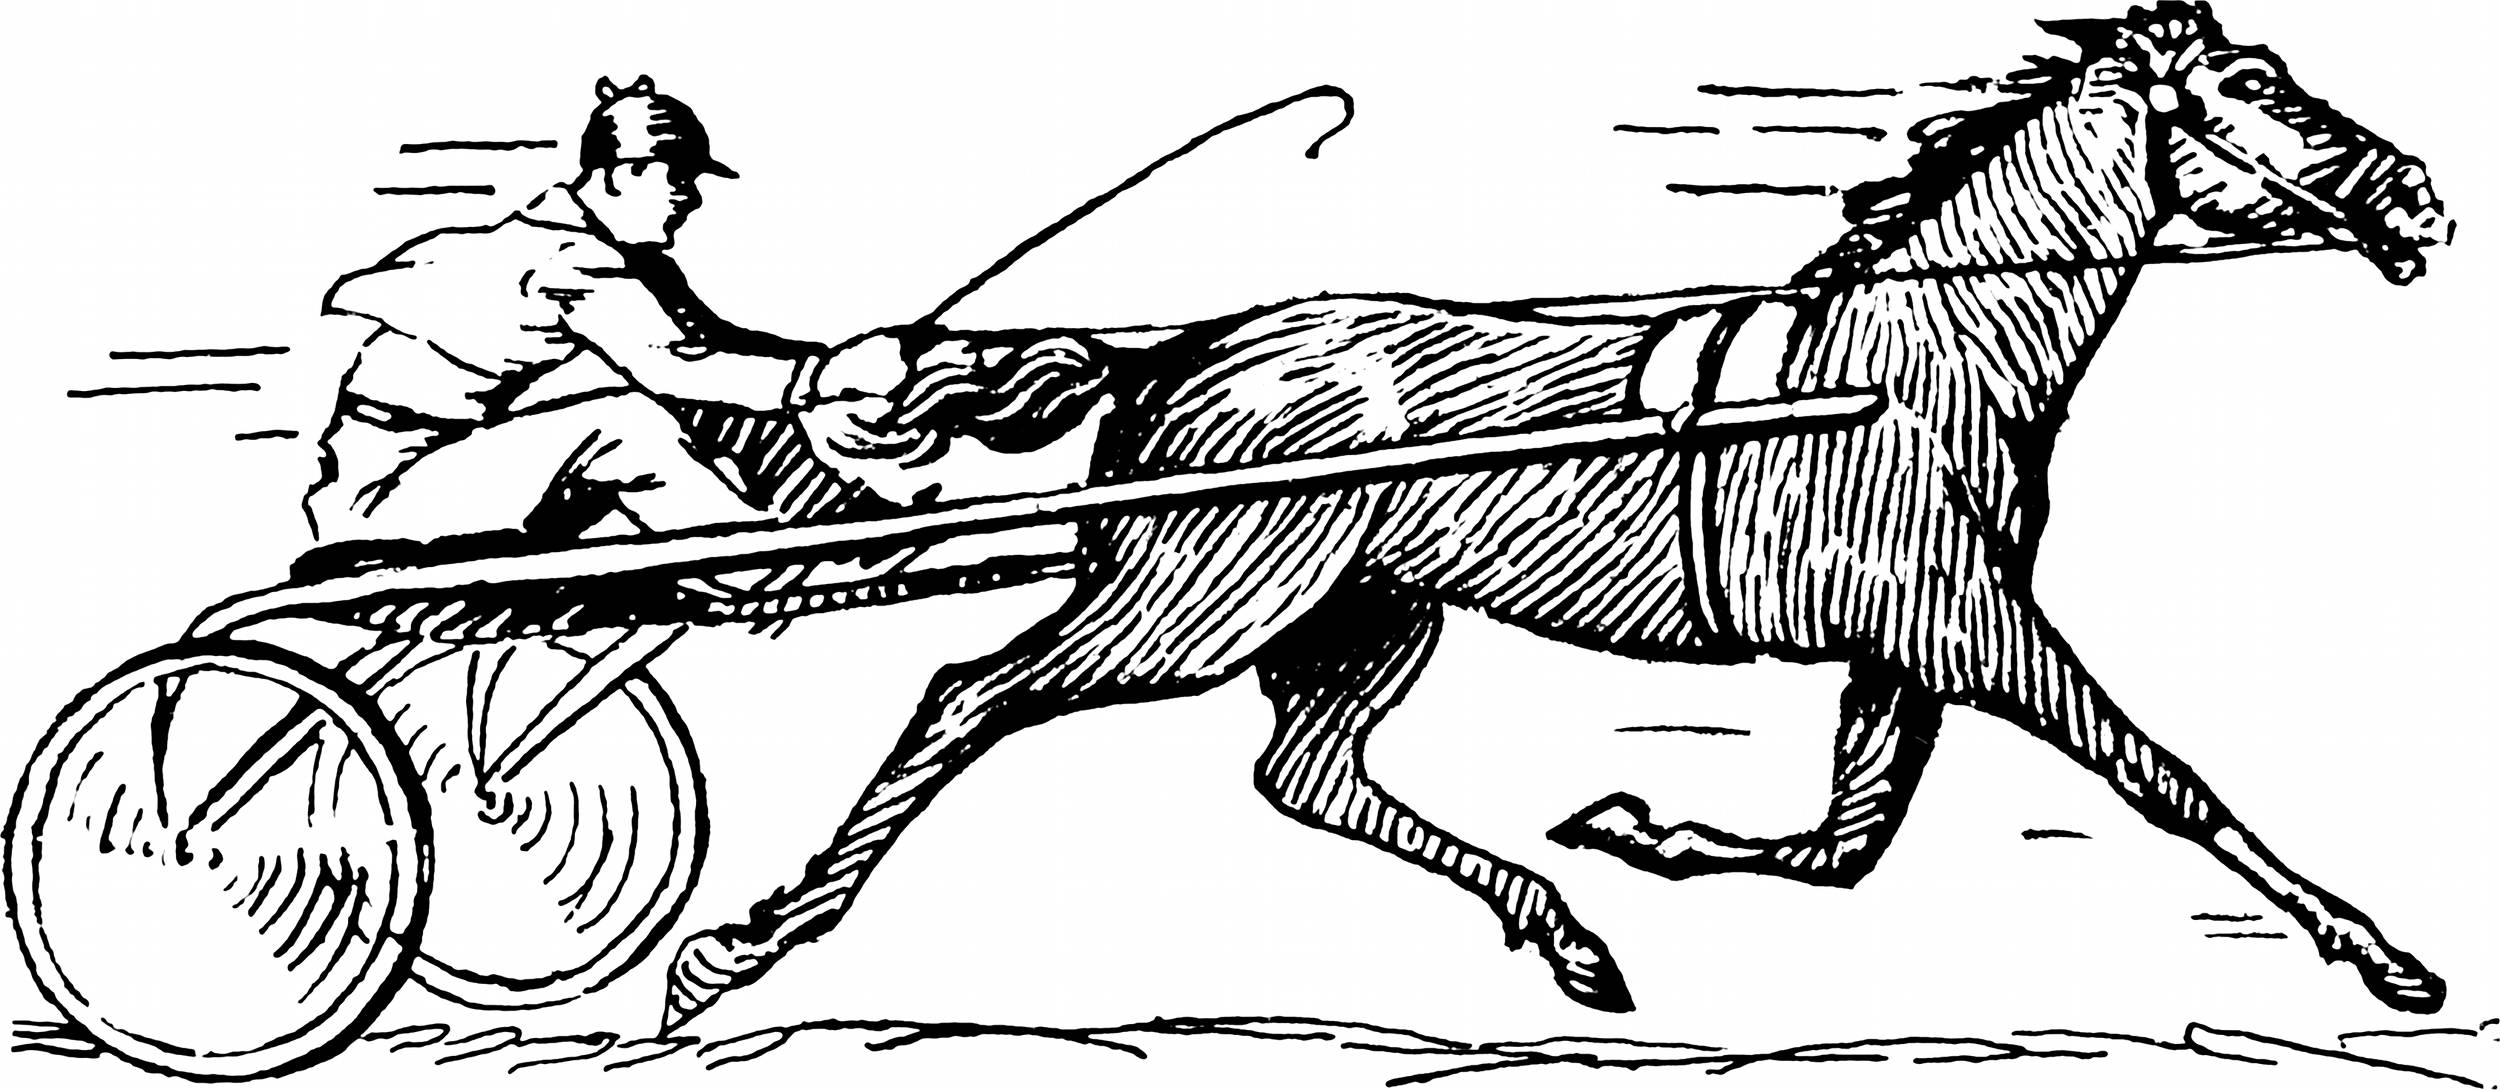 Kleurplaat Paard Springen Horse Line Drawings To Color The Equinest